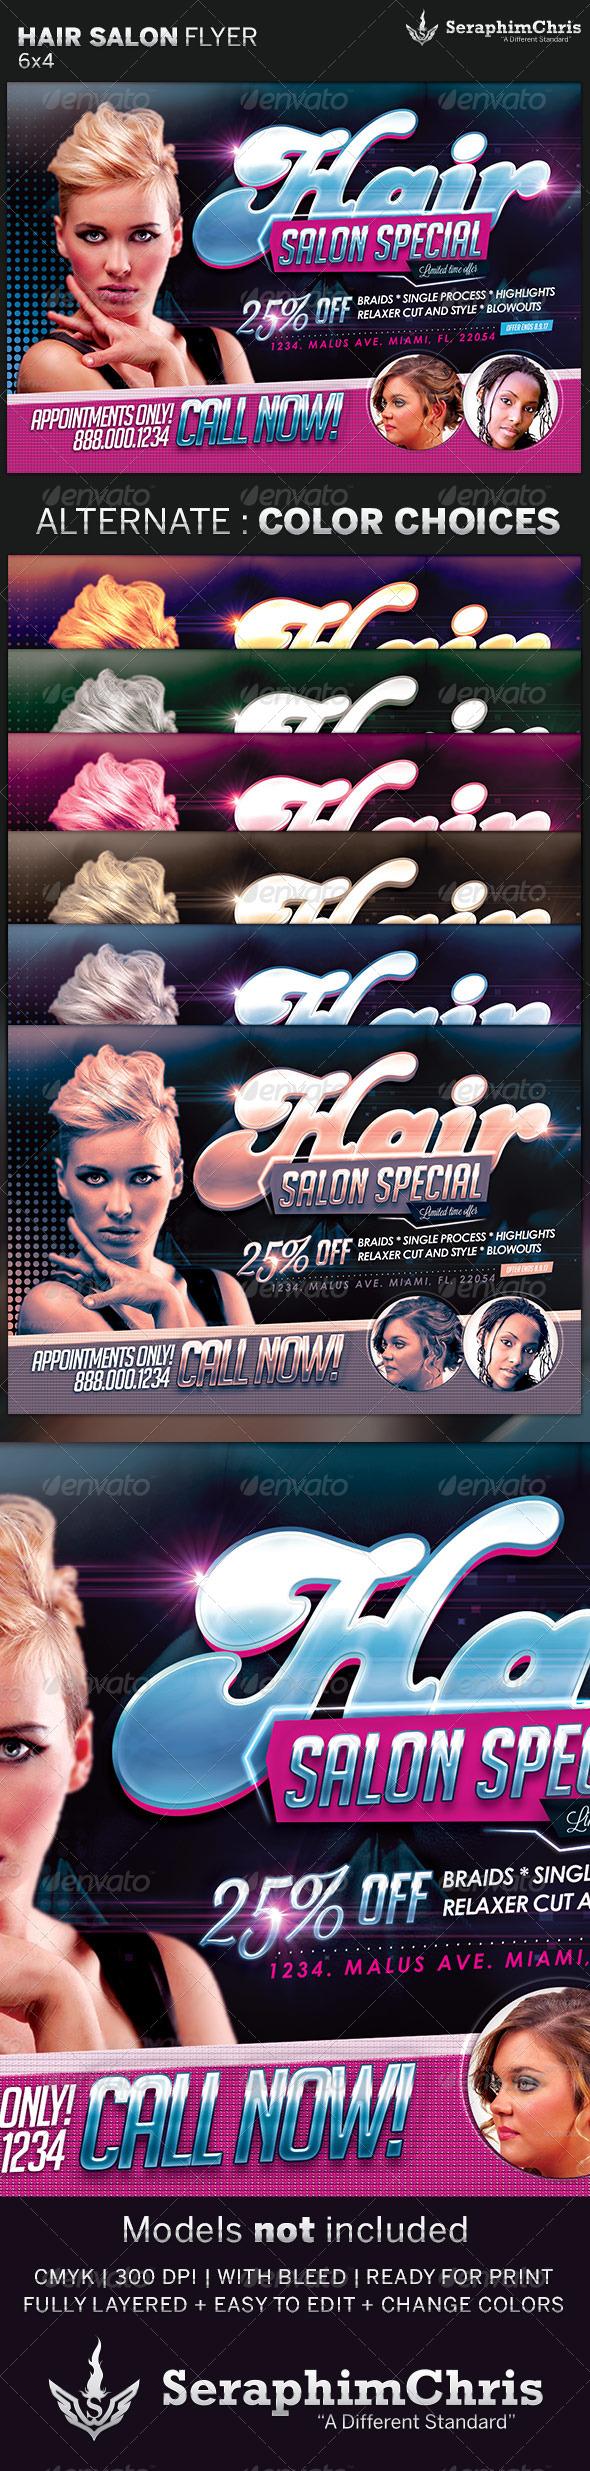 hair salon flyer template – Hair Salon Flyer Template